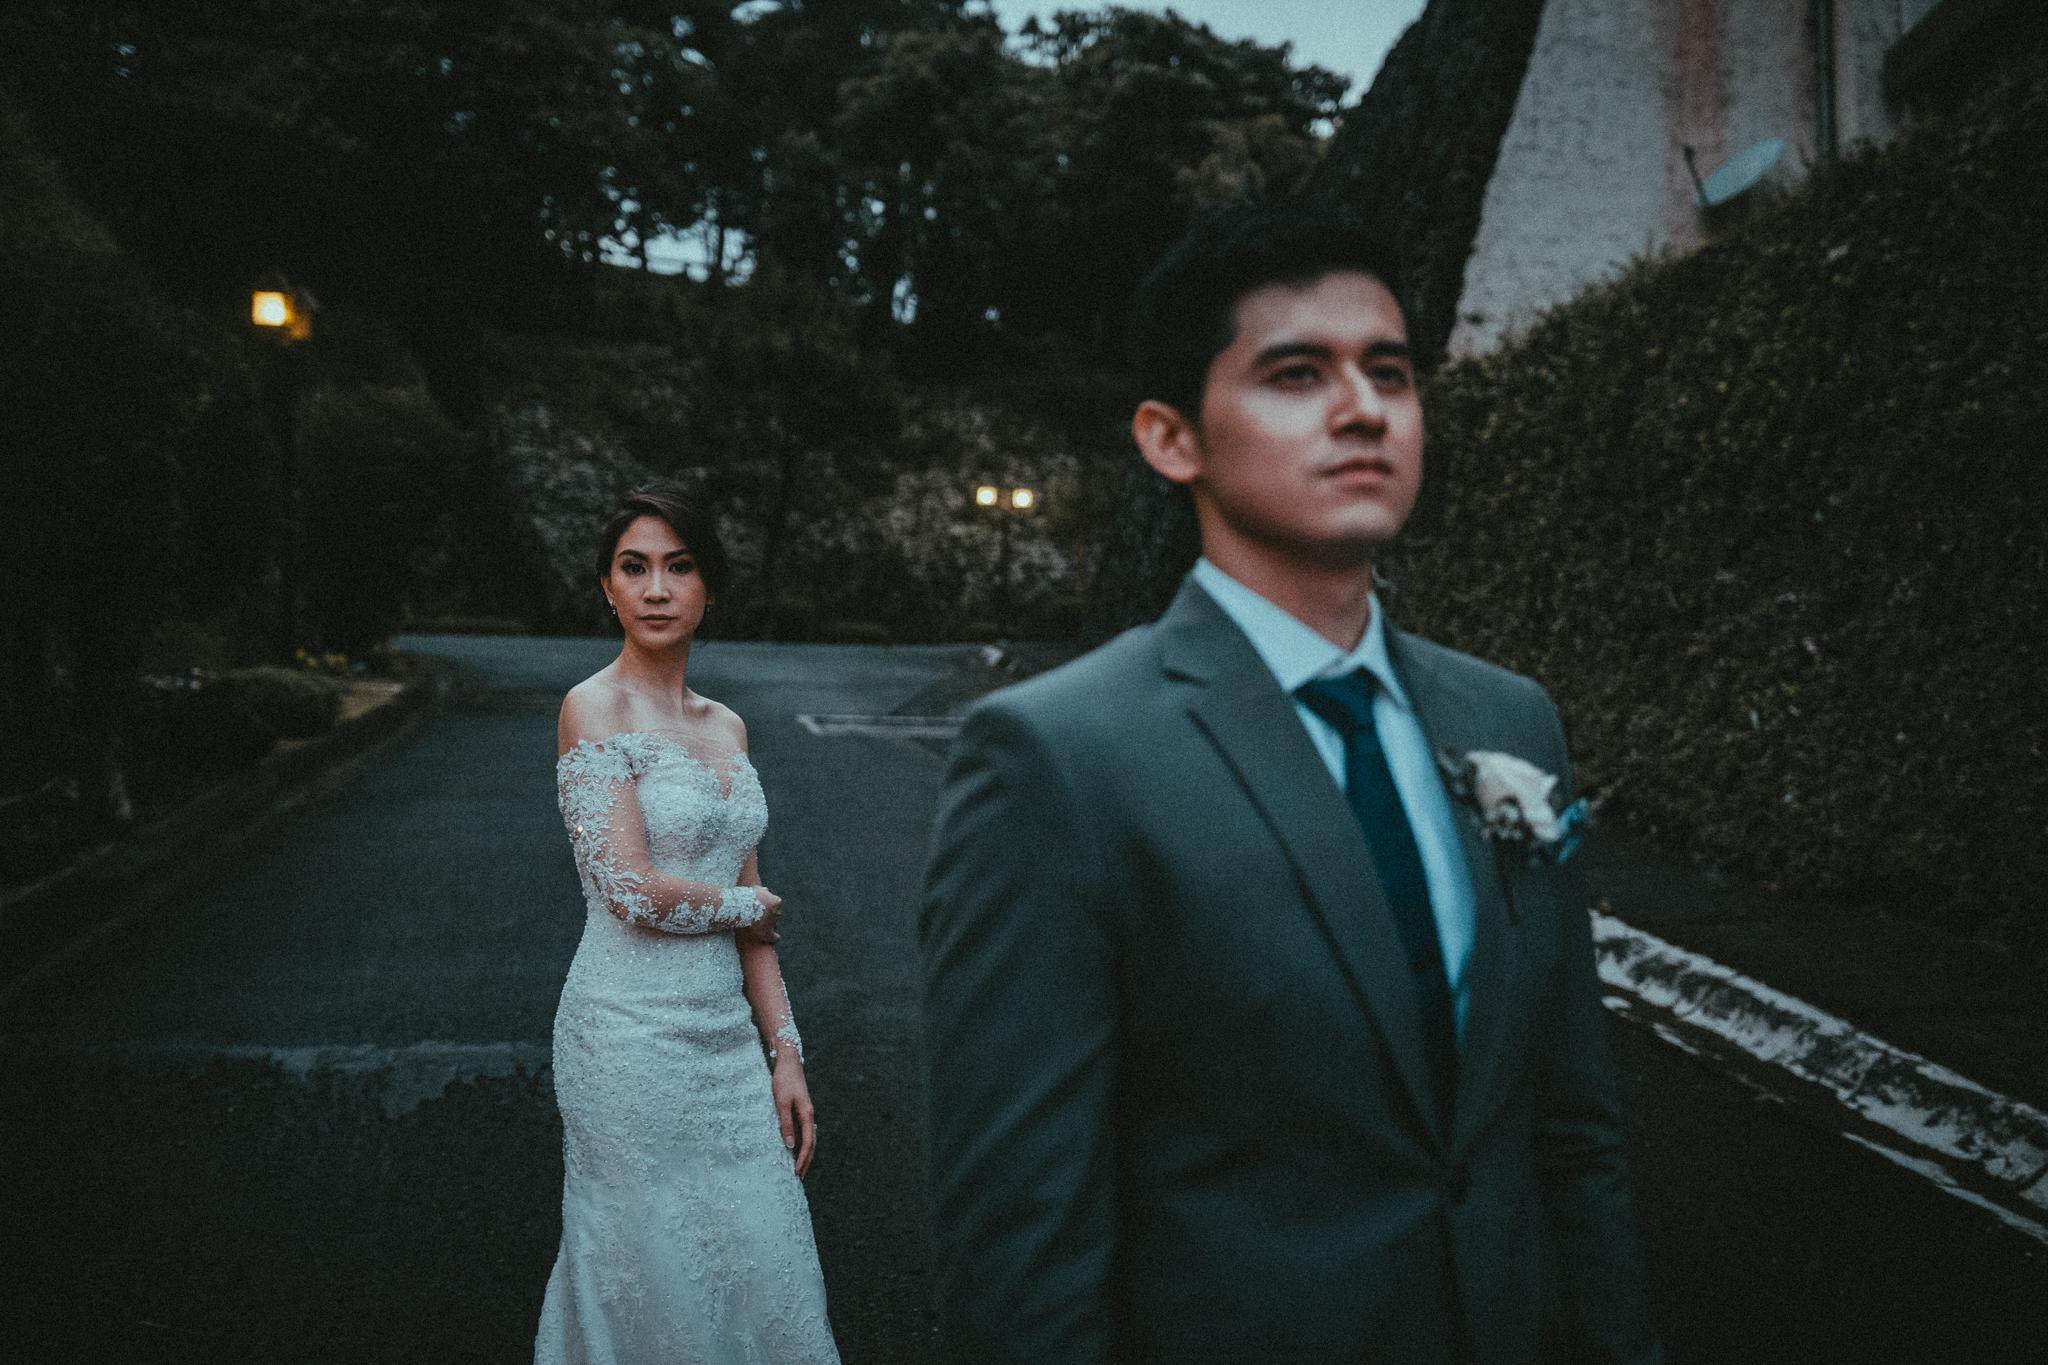 junsi x impy - TAGAYTAY, PHILIPPINES